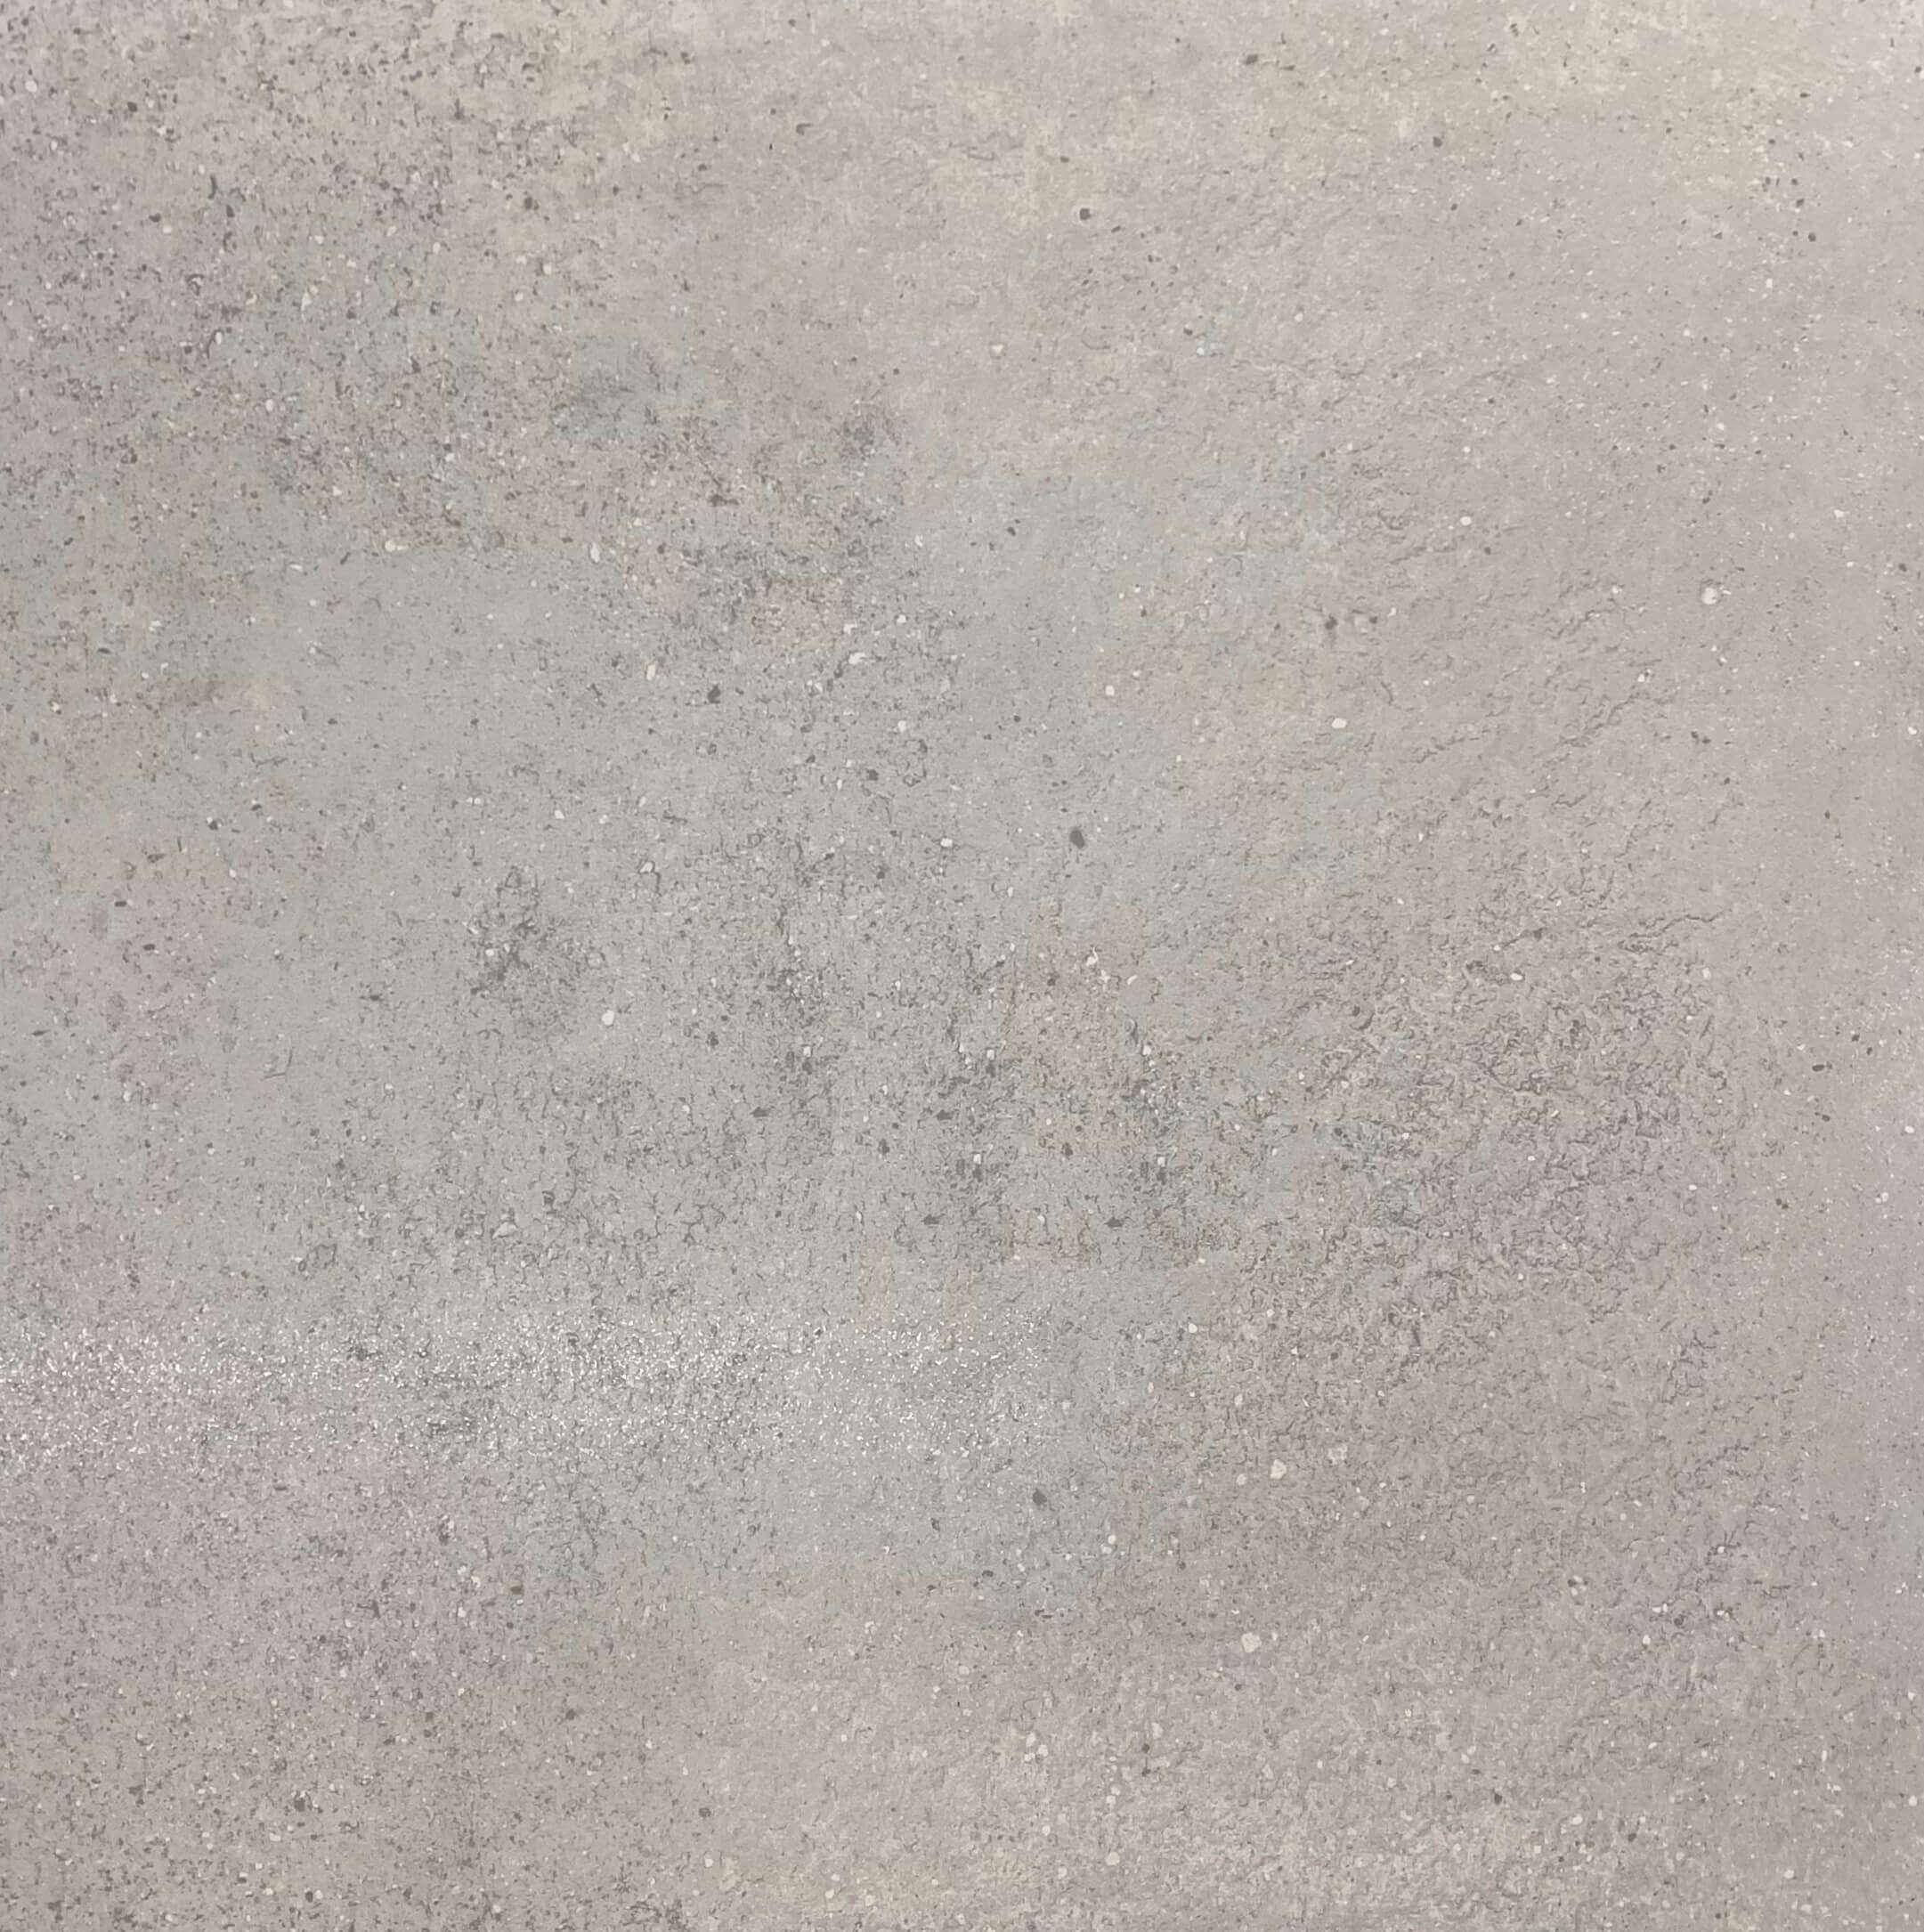 Rock Concrete Grey Lapatto Finish Non Rectified Porcelain Tile 3210